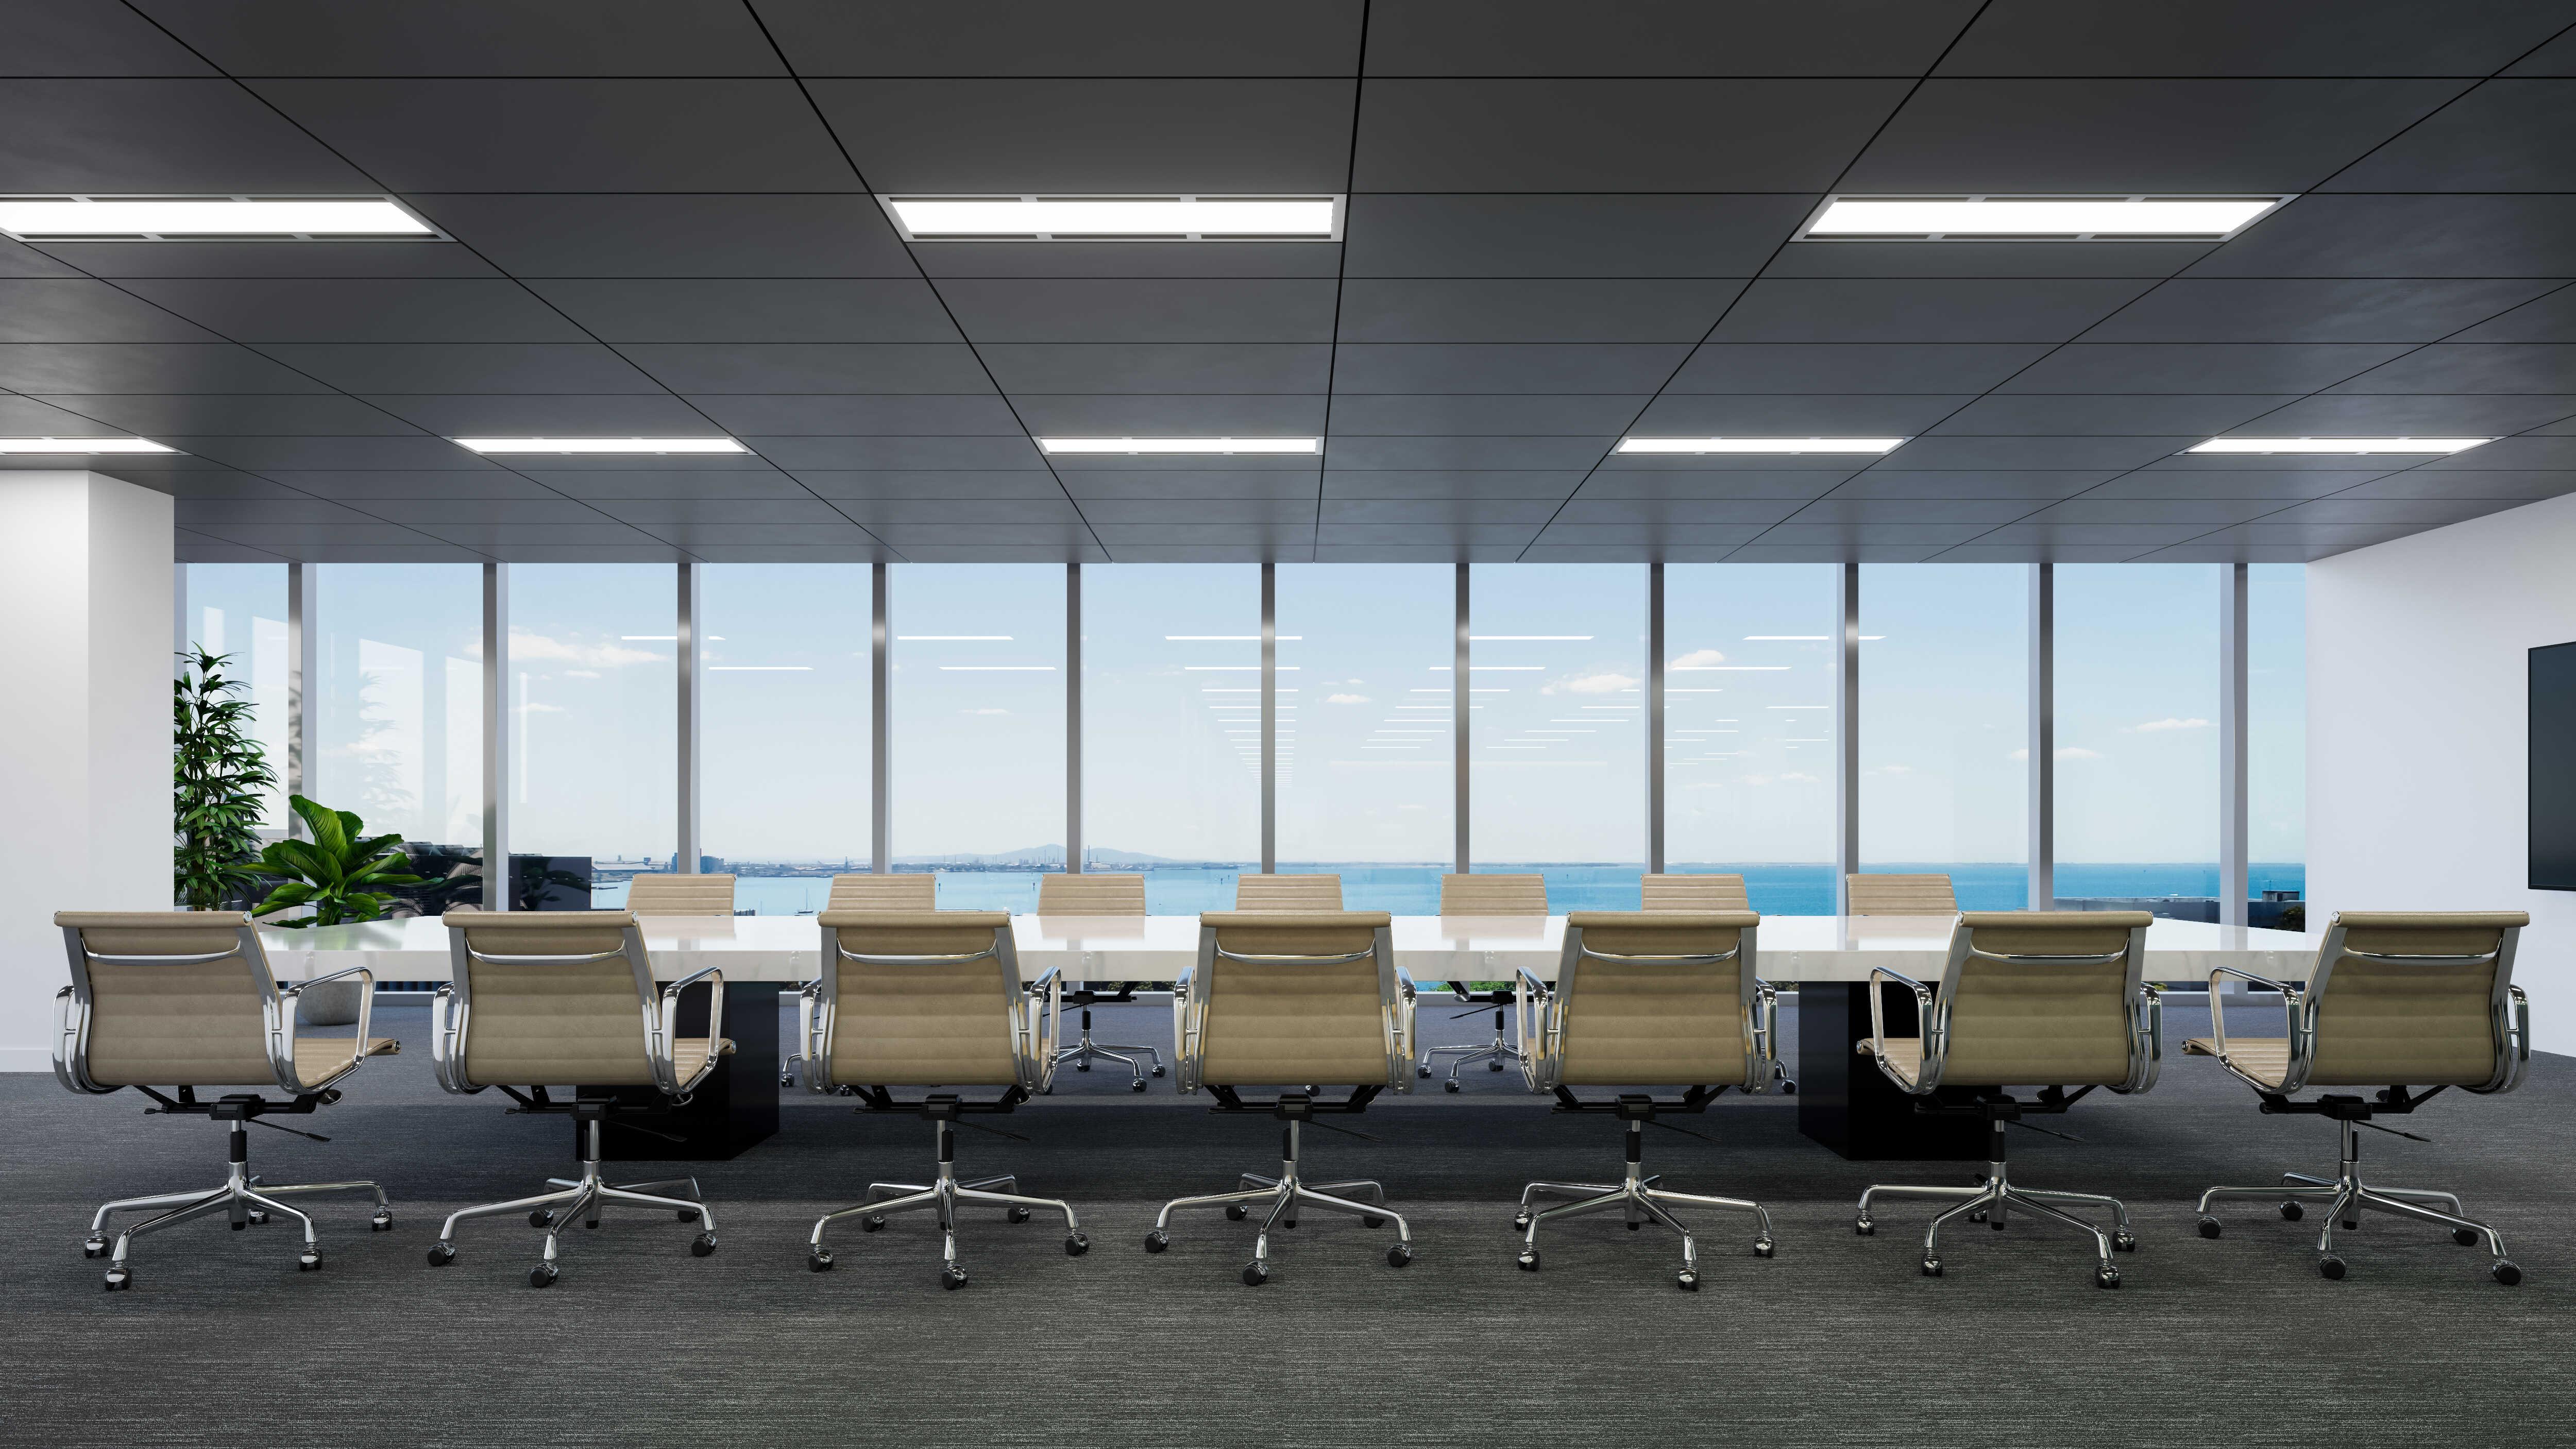 Commercial Interior Render - Board Room